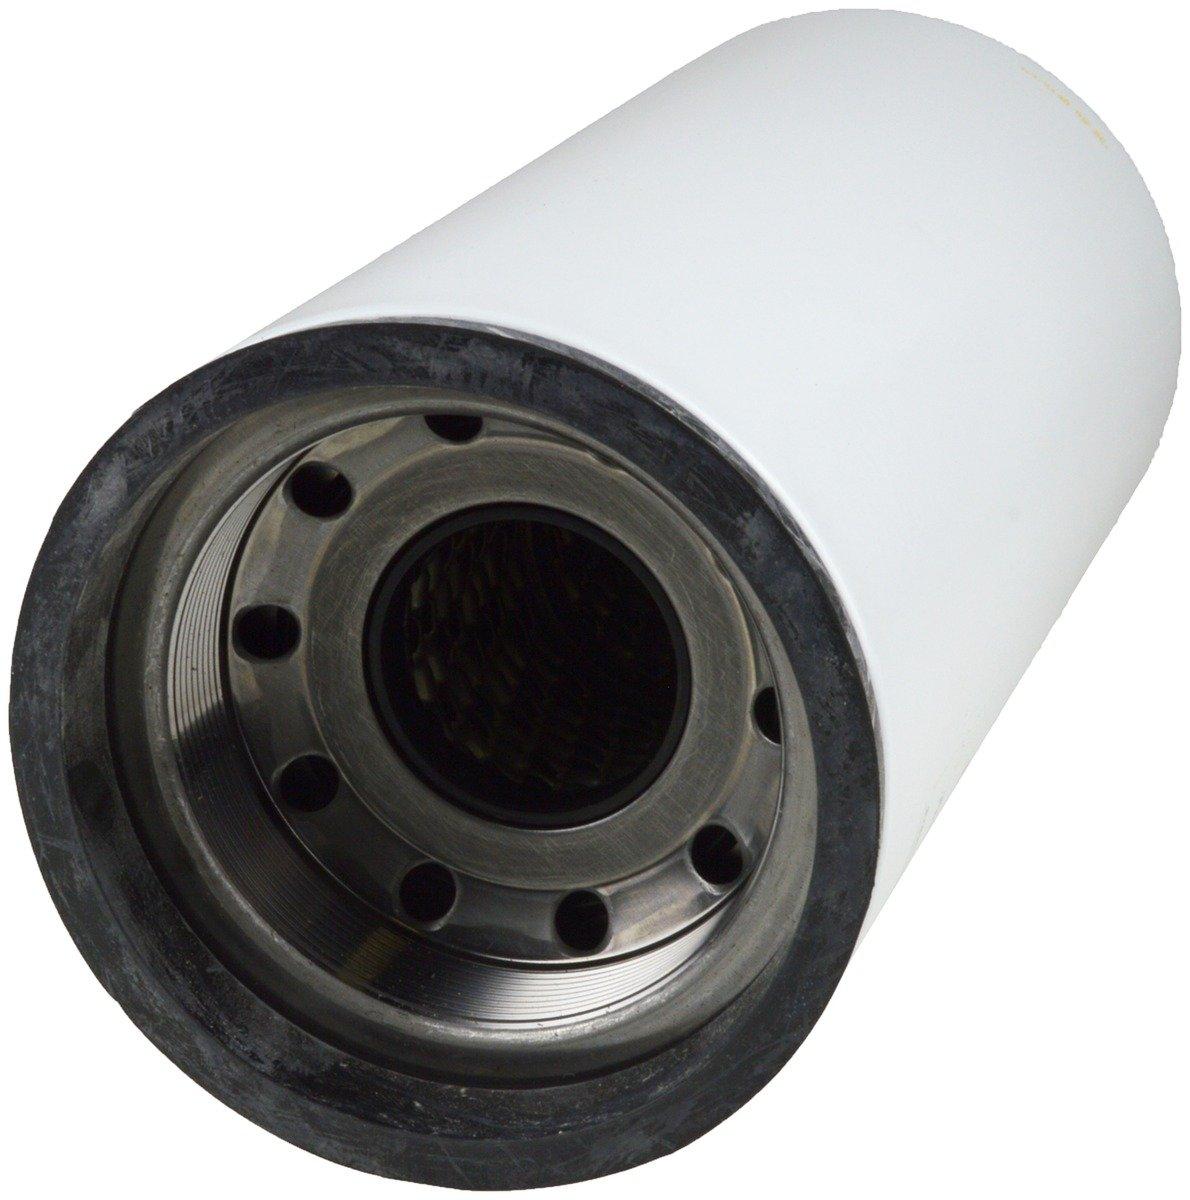 Luber-finer LFF1007 1 Pack Automotive Accessories